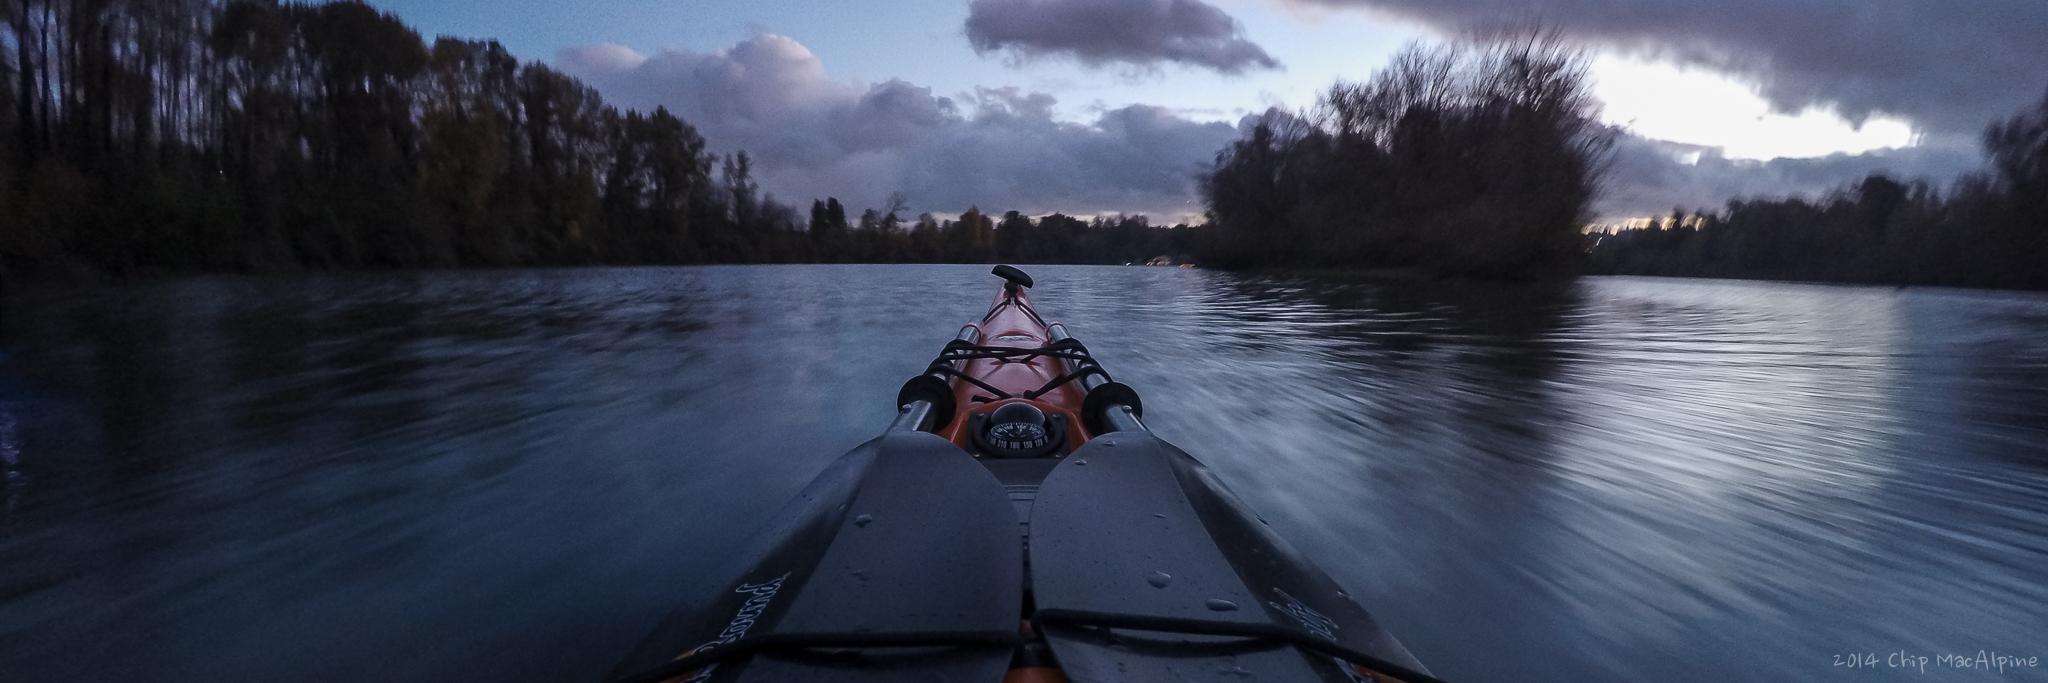 chip_macalpine_ross_island_kayaking-0046490